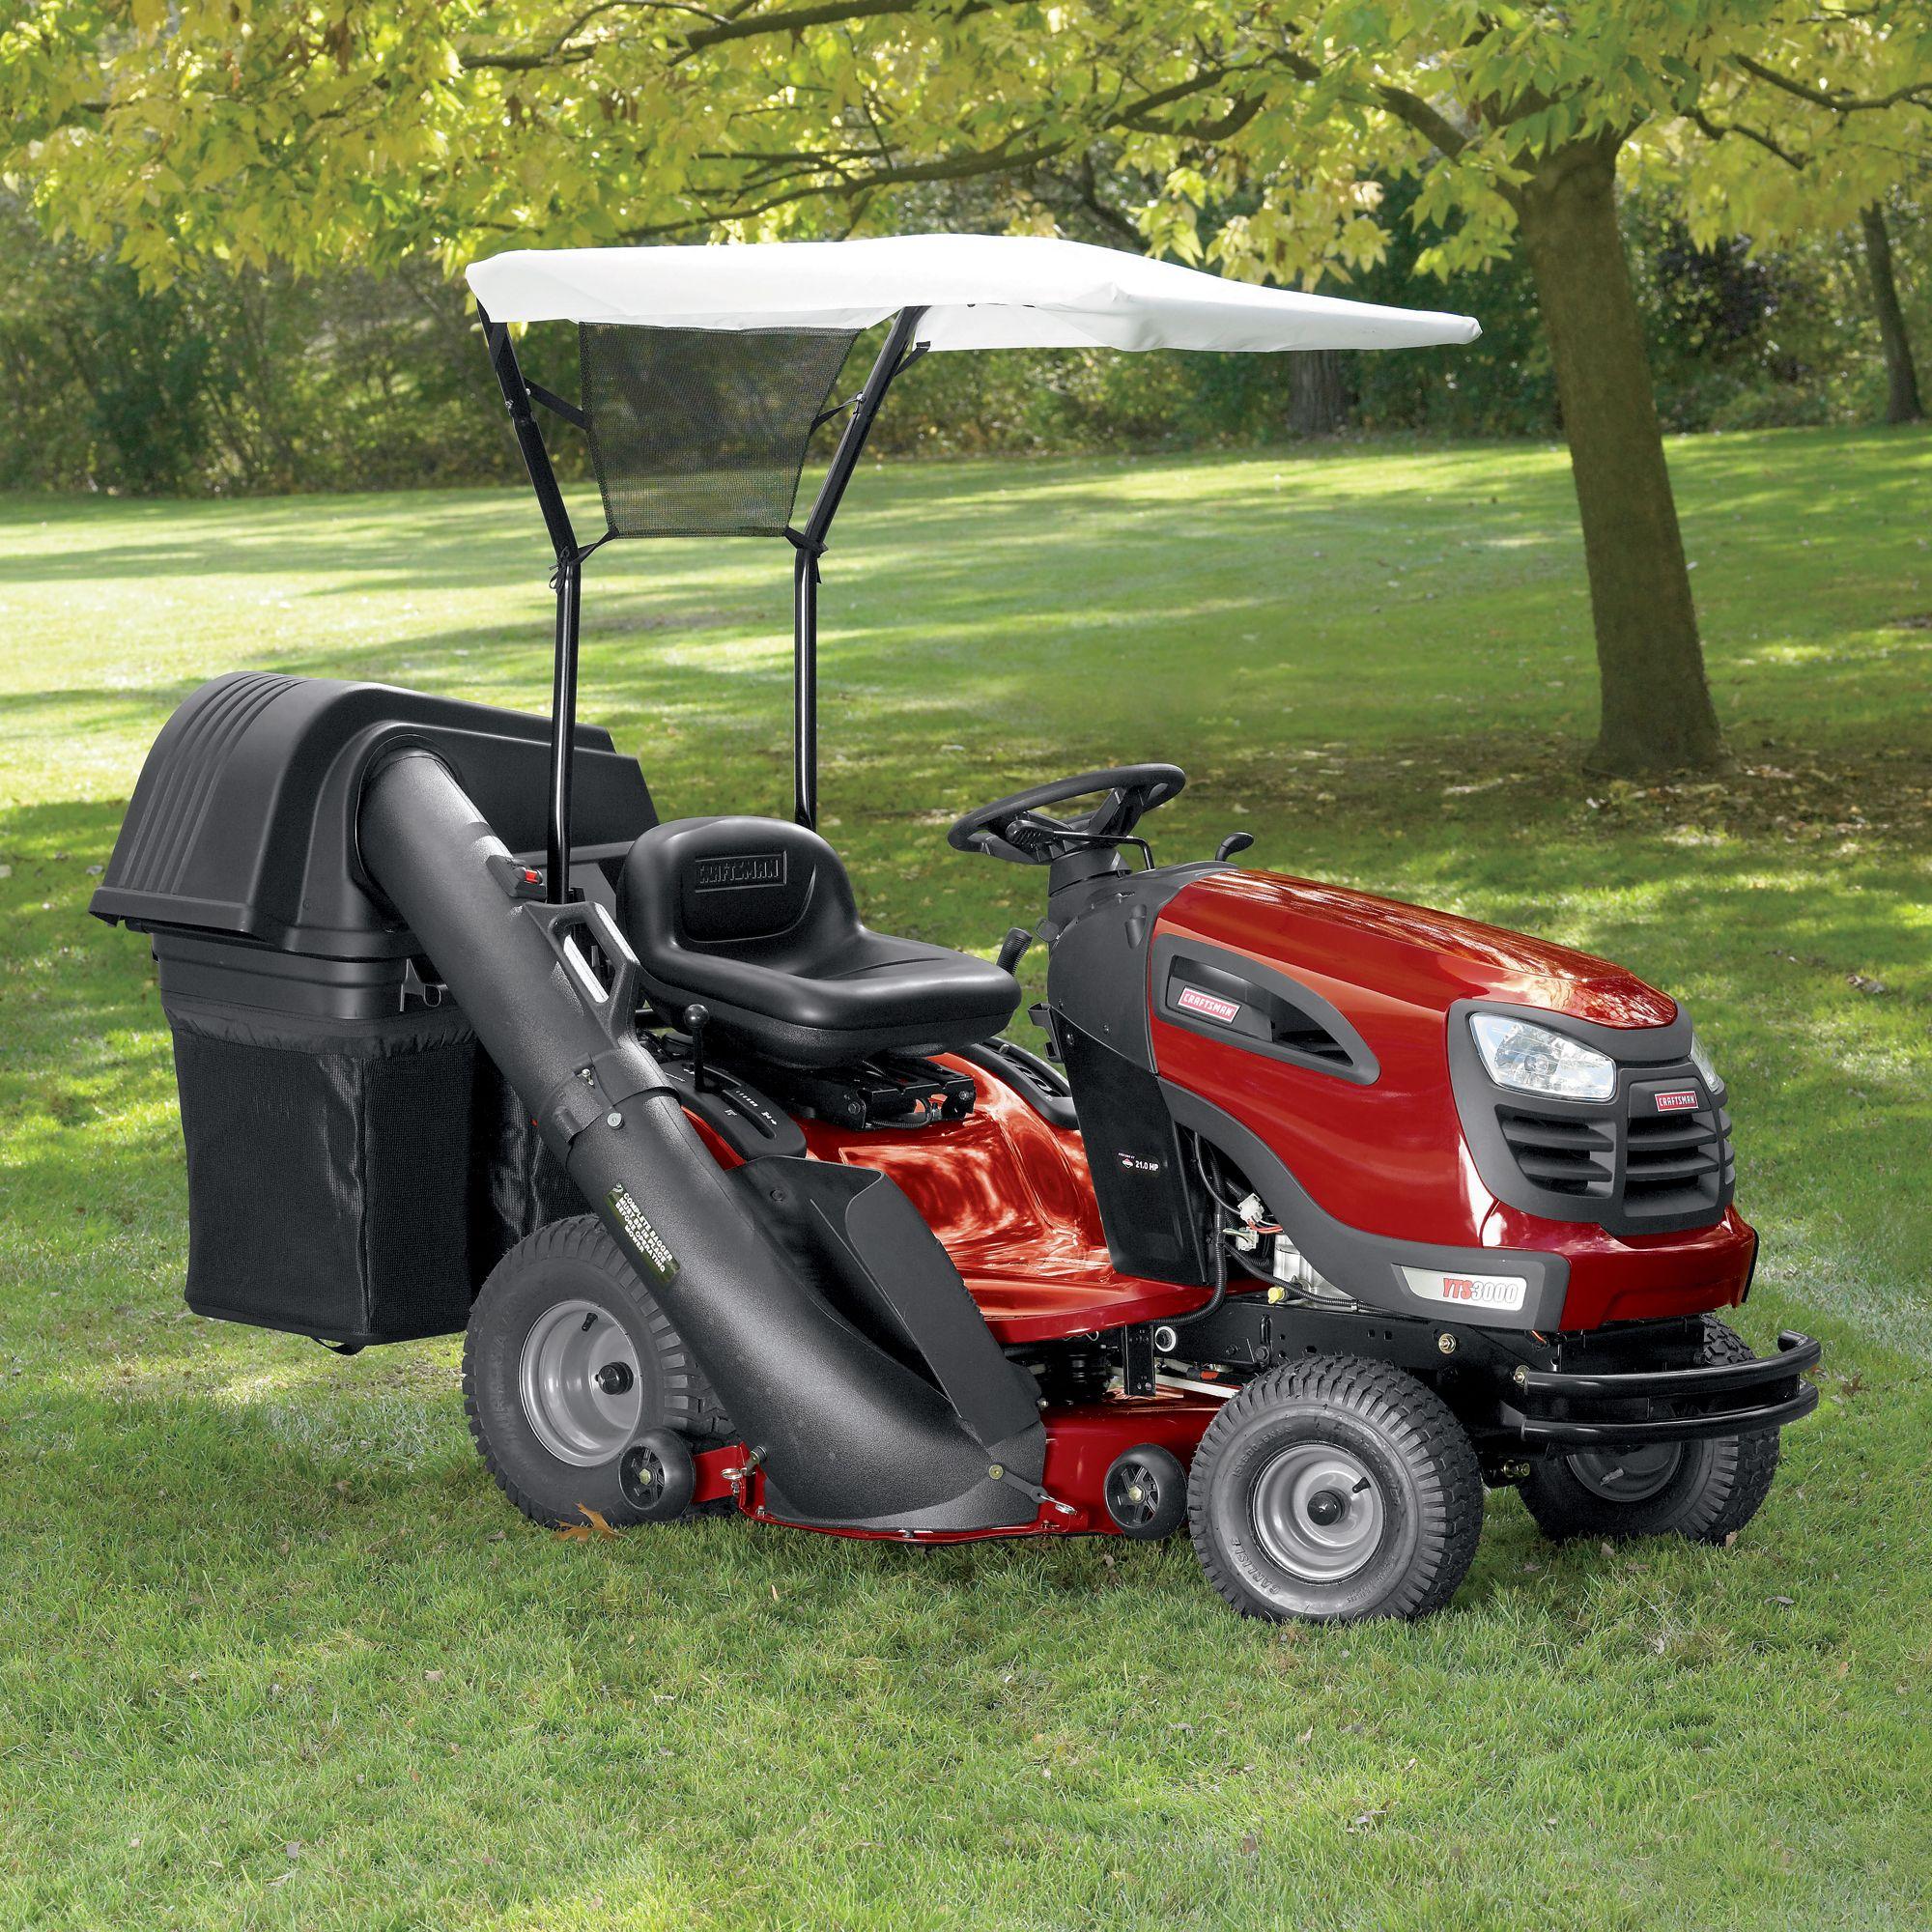 Craftsman Grass Bagger : Craftsman lawn tractor bagger parts myideasbedroom